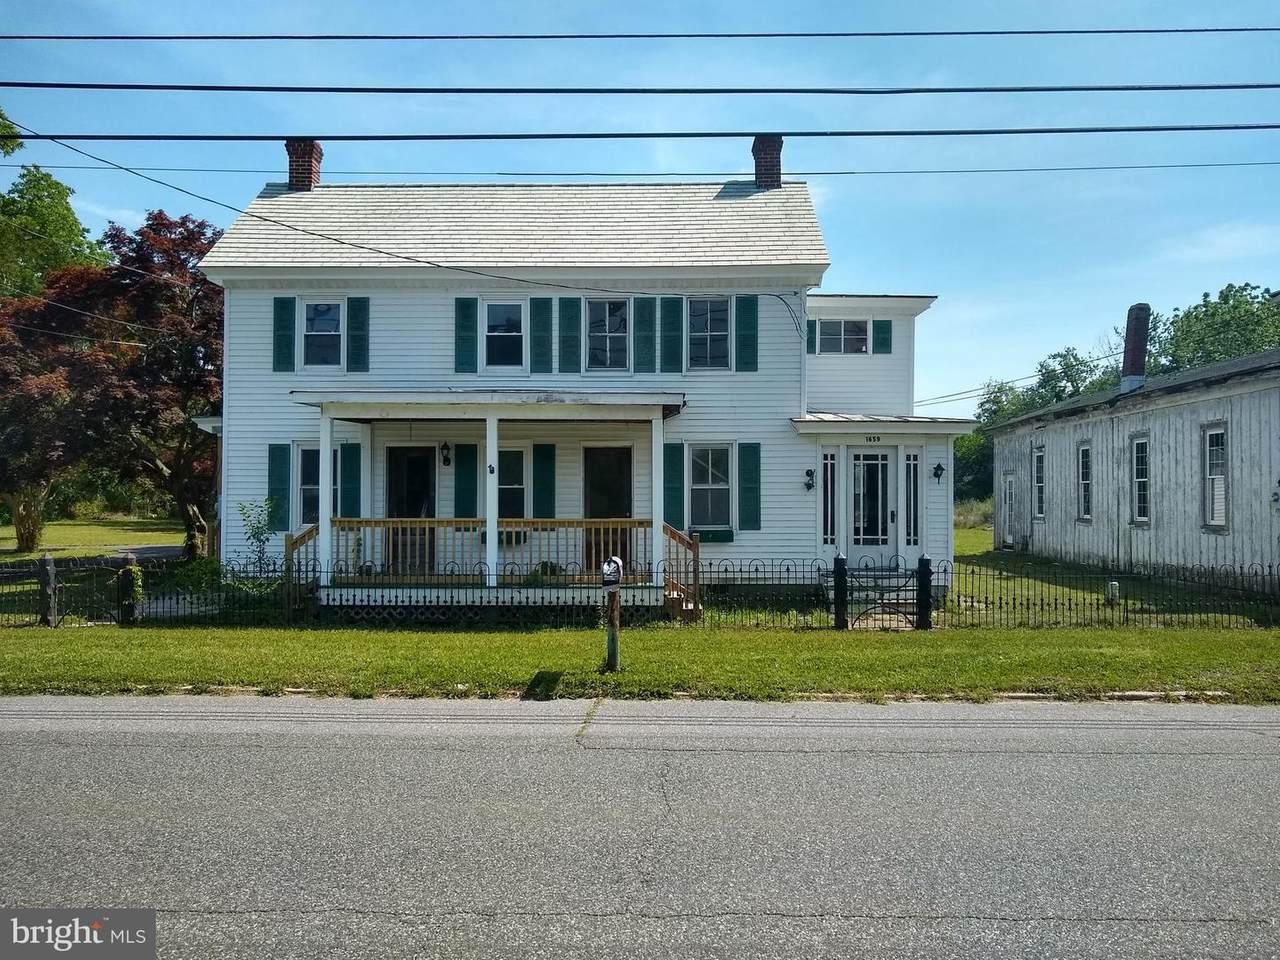 1655 Main Street - Photo 1